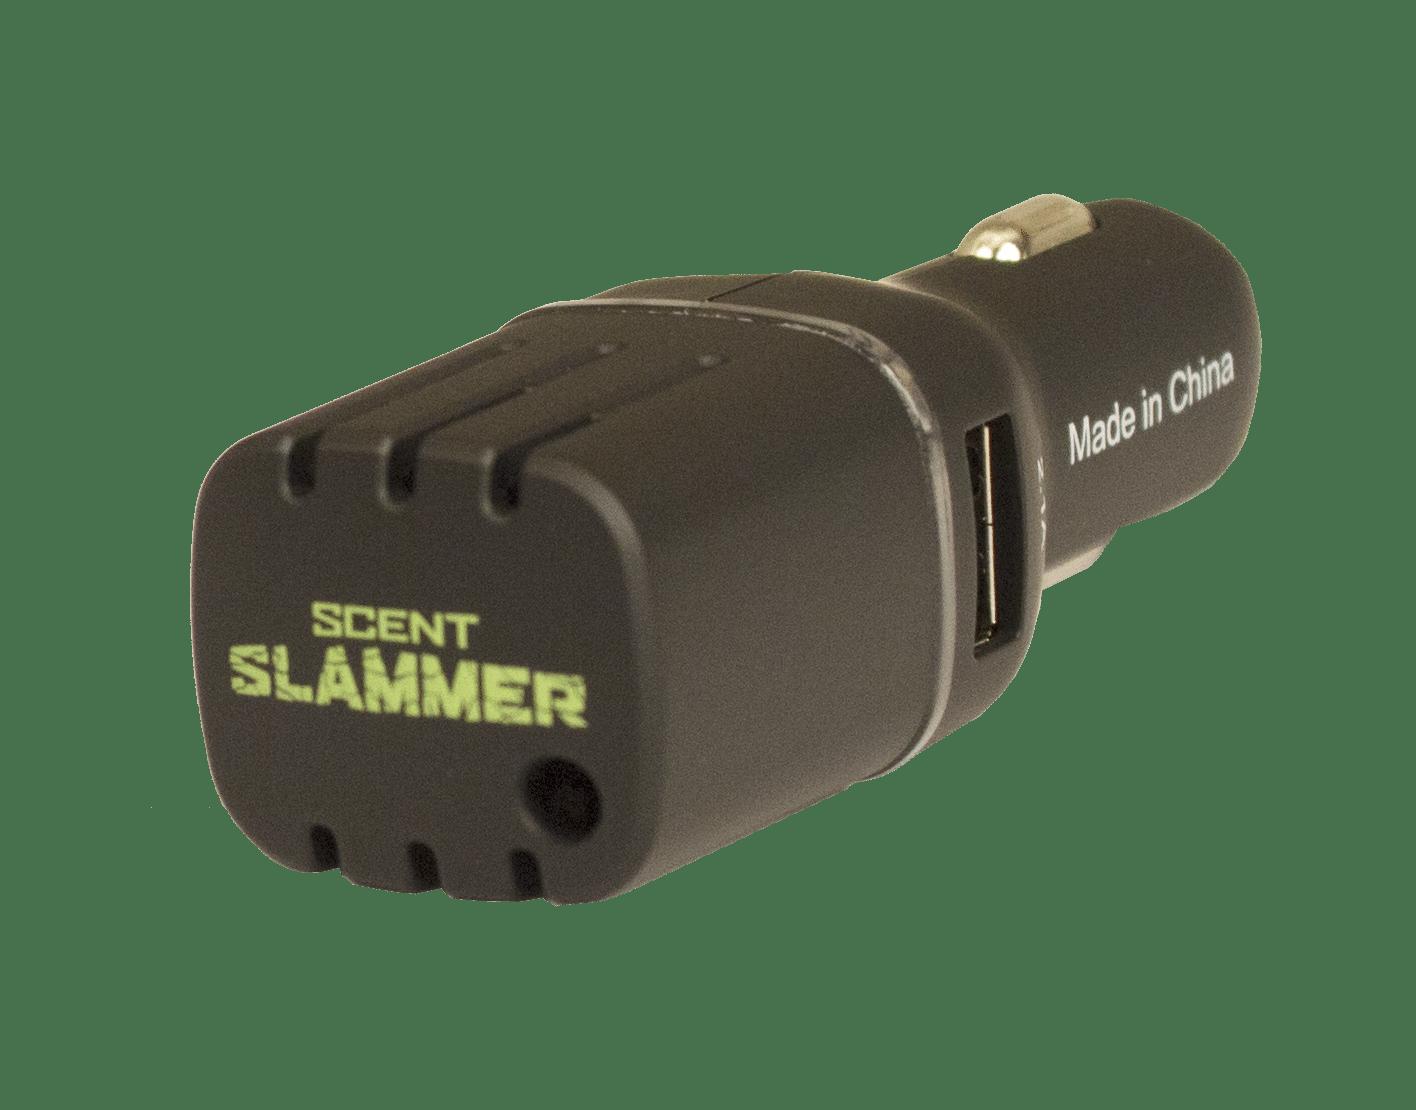 HME HMEAPUR Ozone Air Purifier, 12v with duel USB Ports